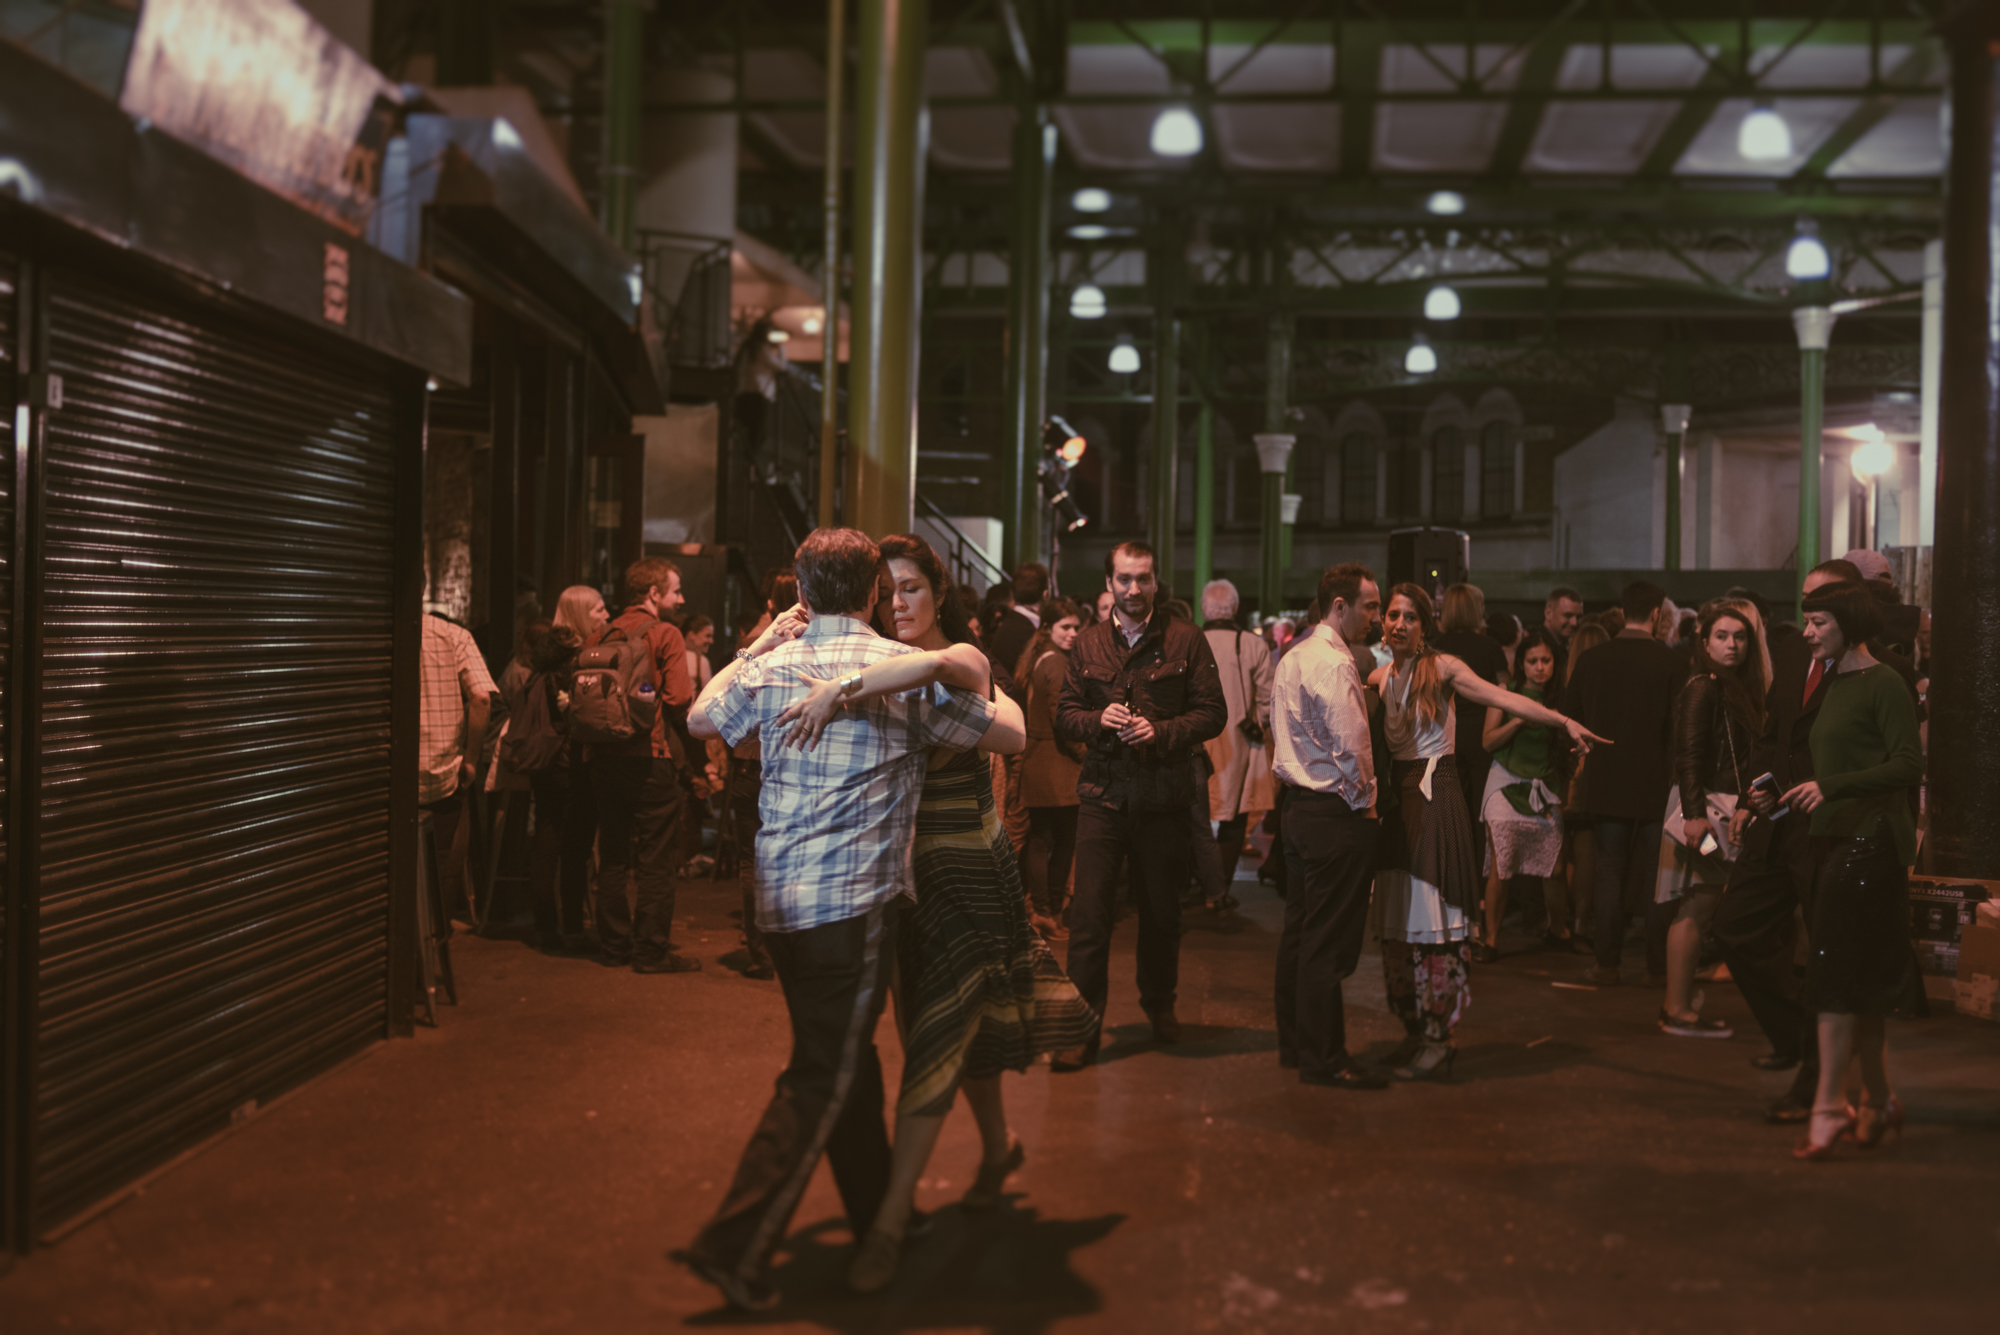 London street photography borough market dancing